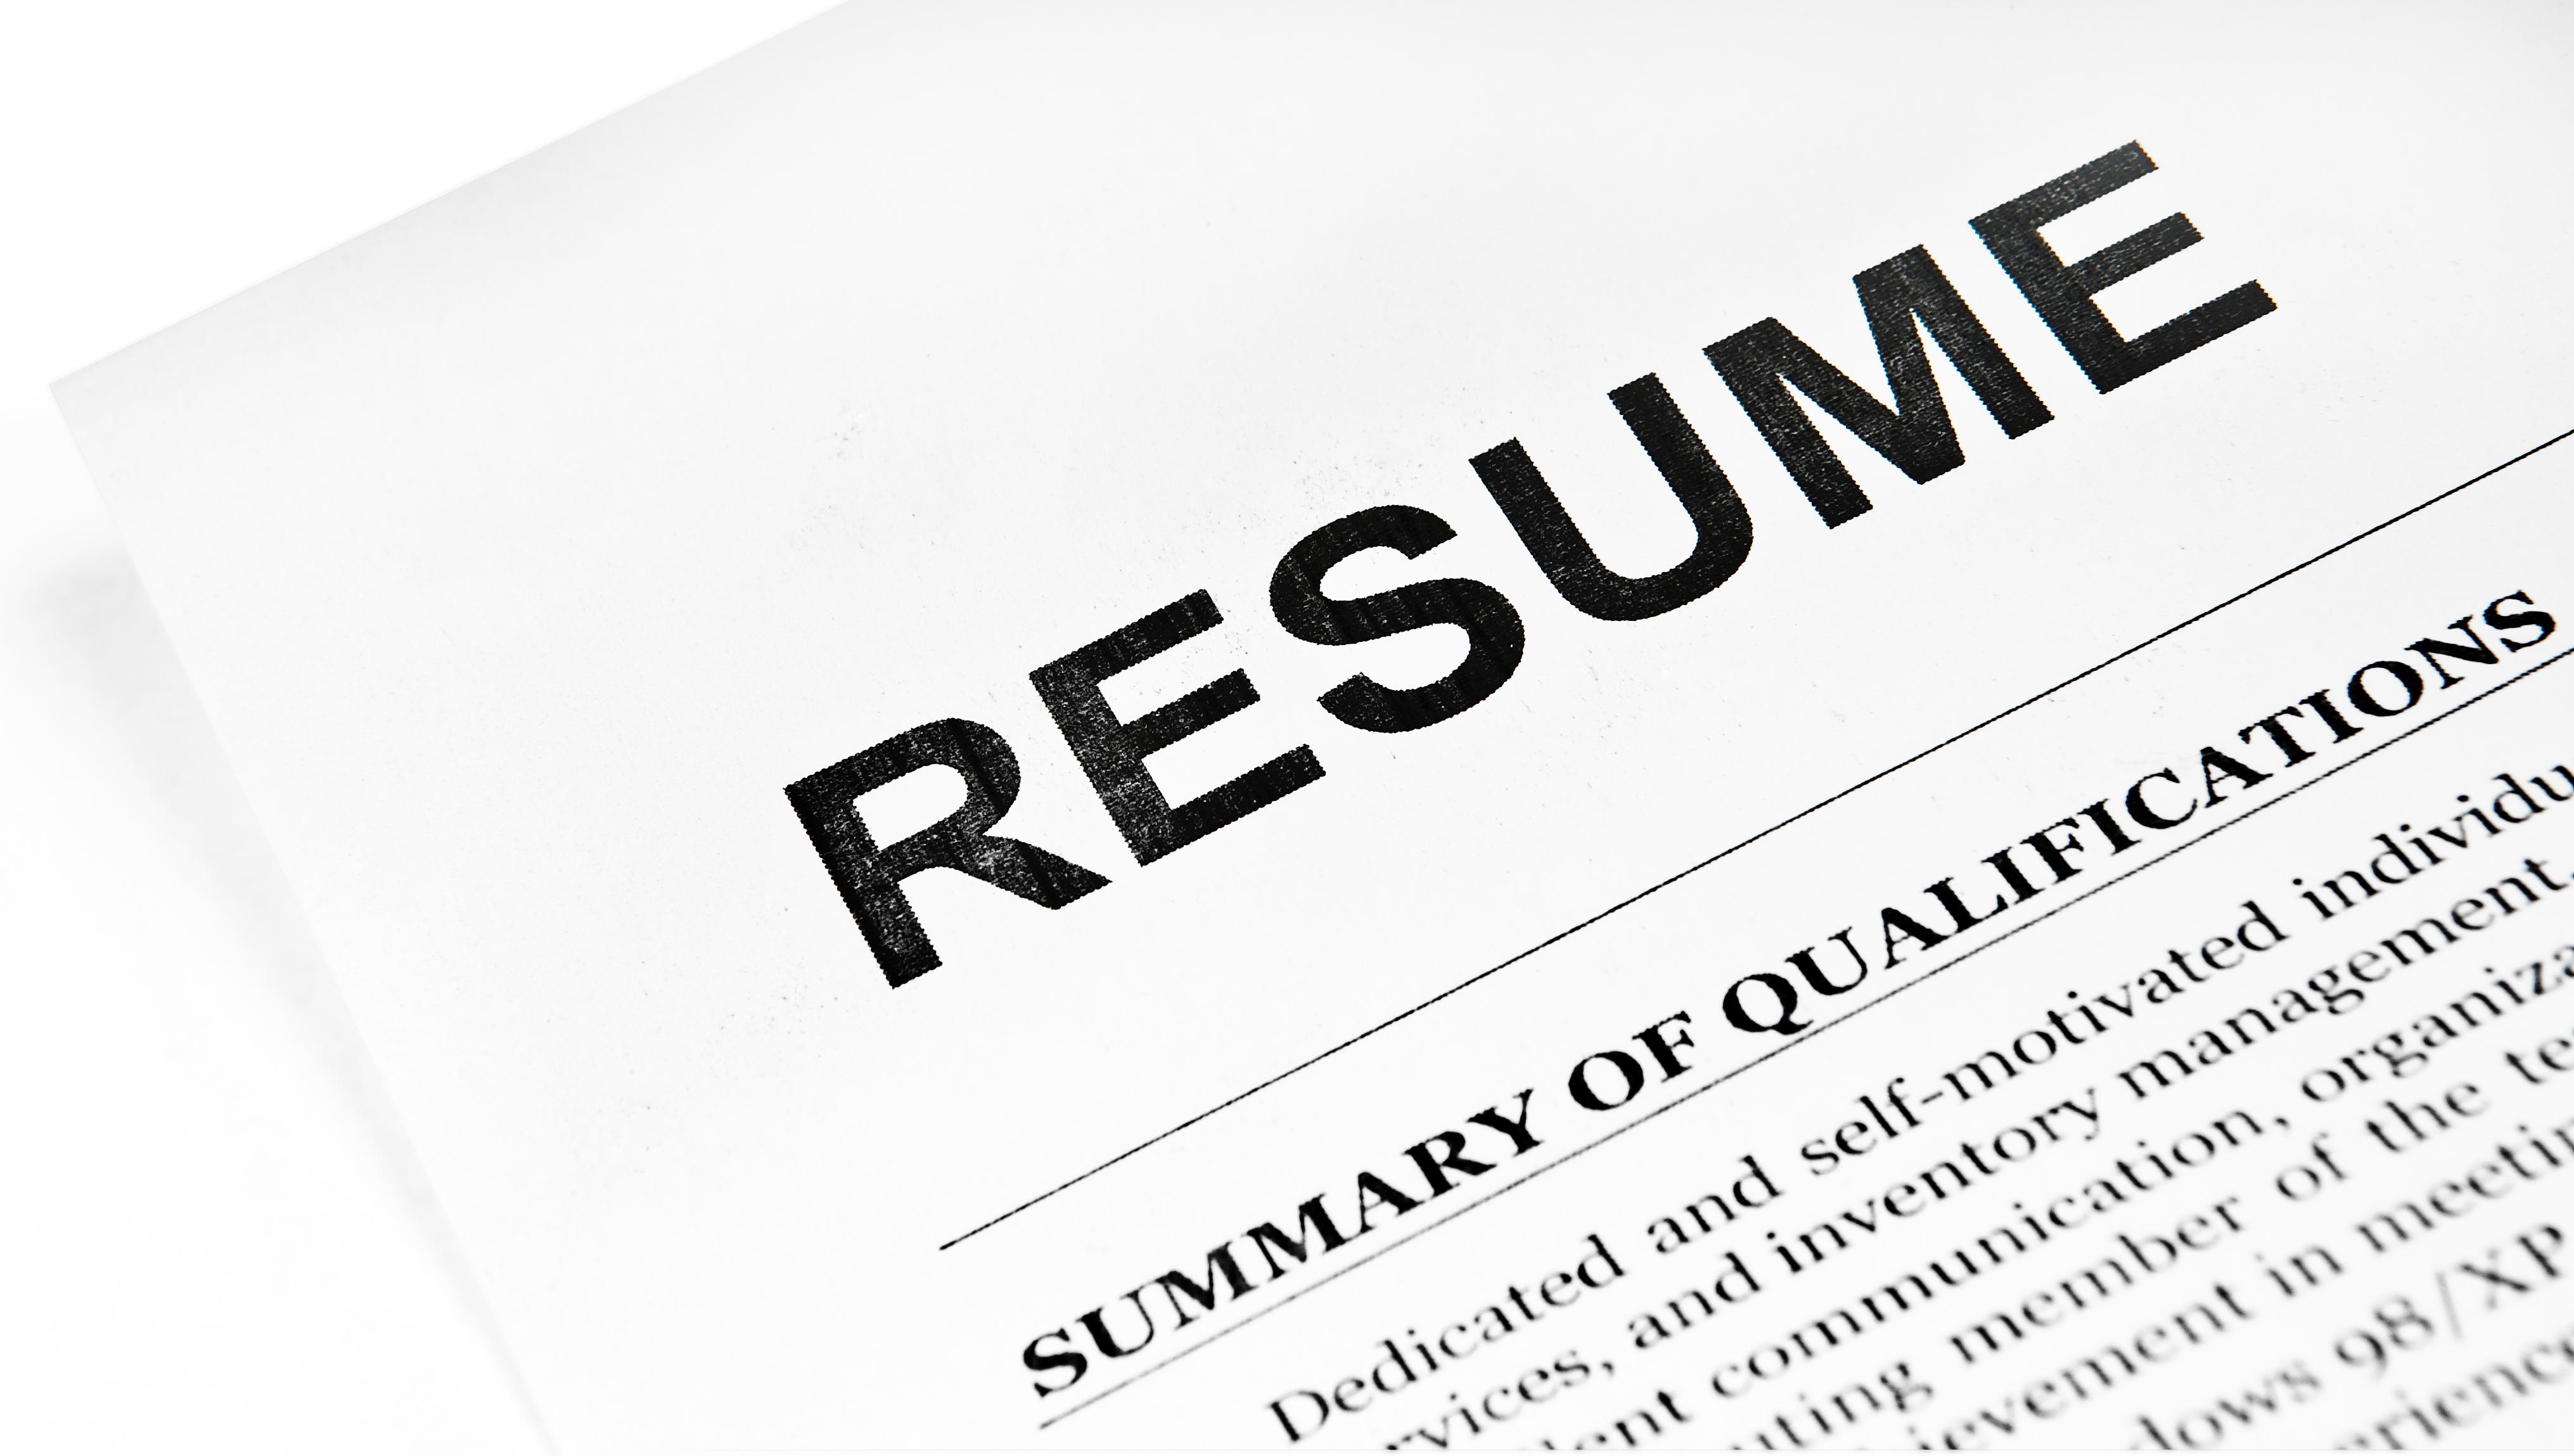 tailor resume to job